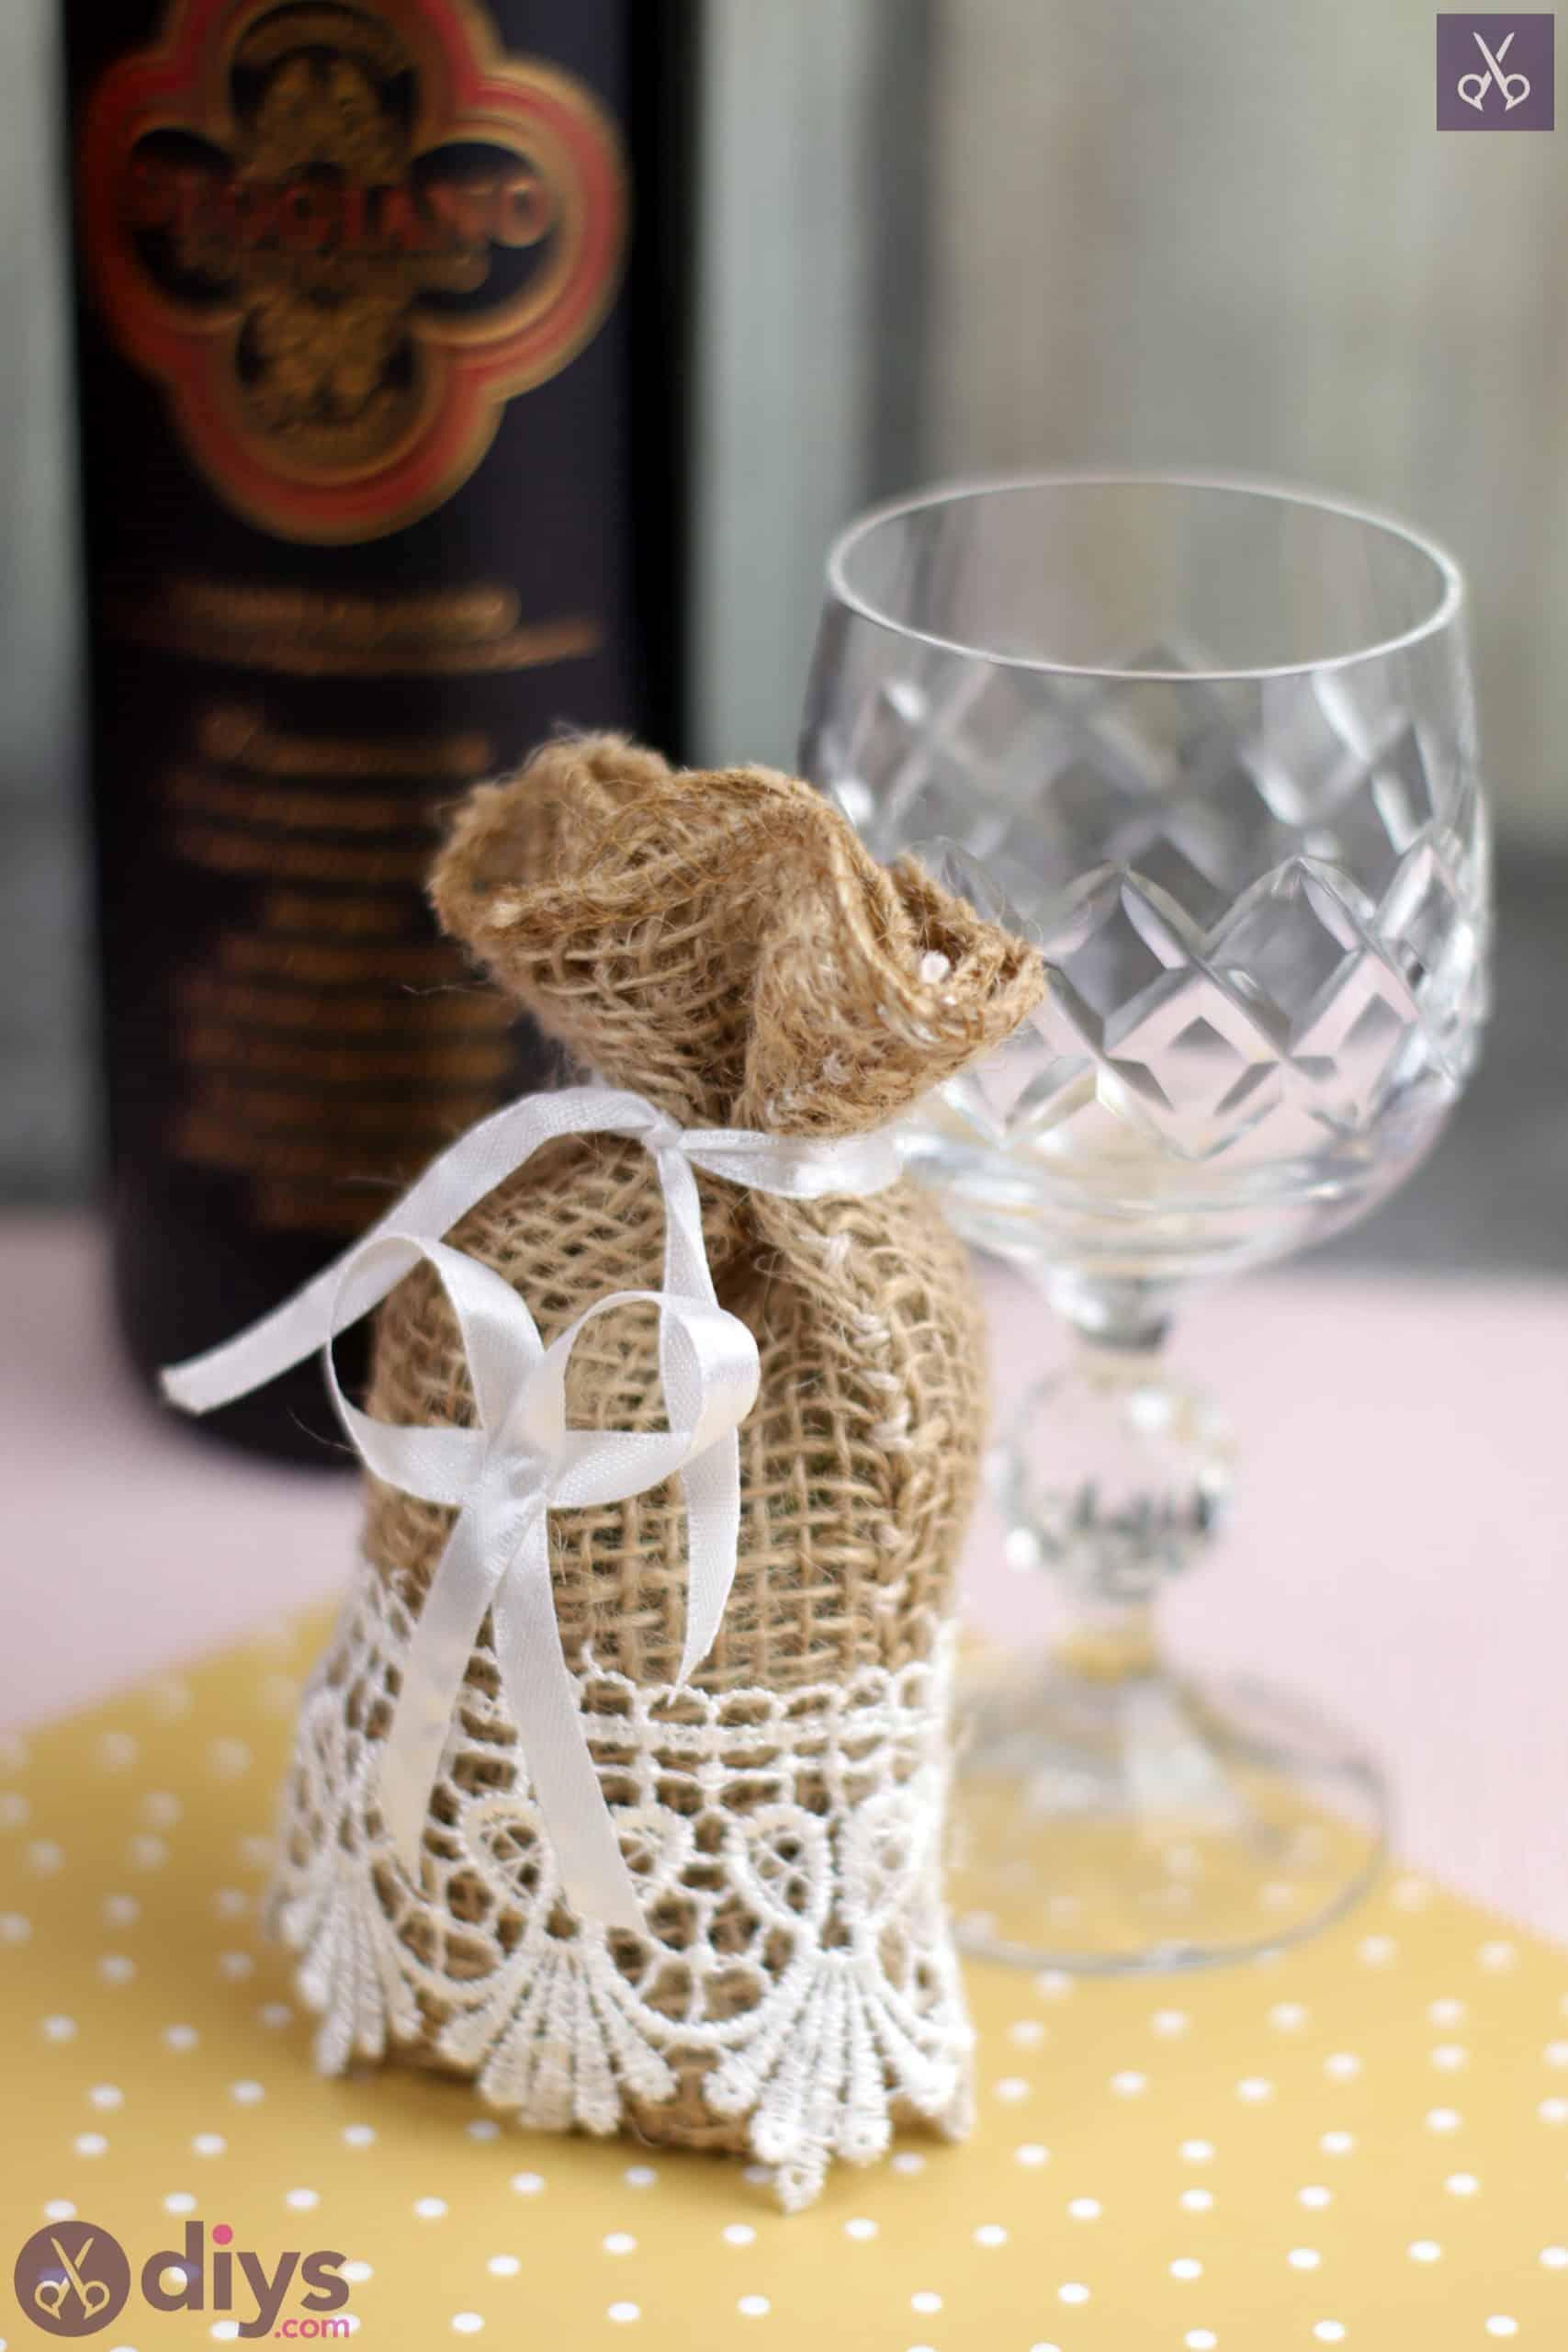 Diy rustic wedding favour bag project